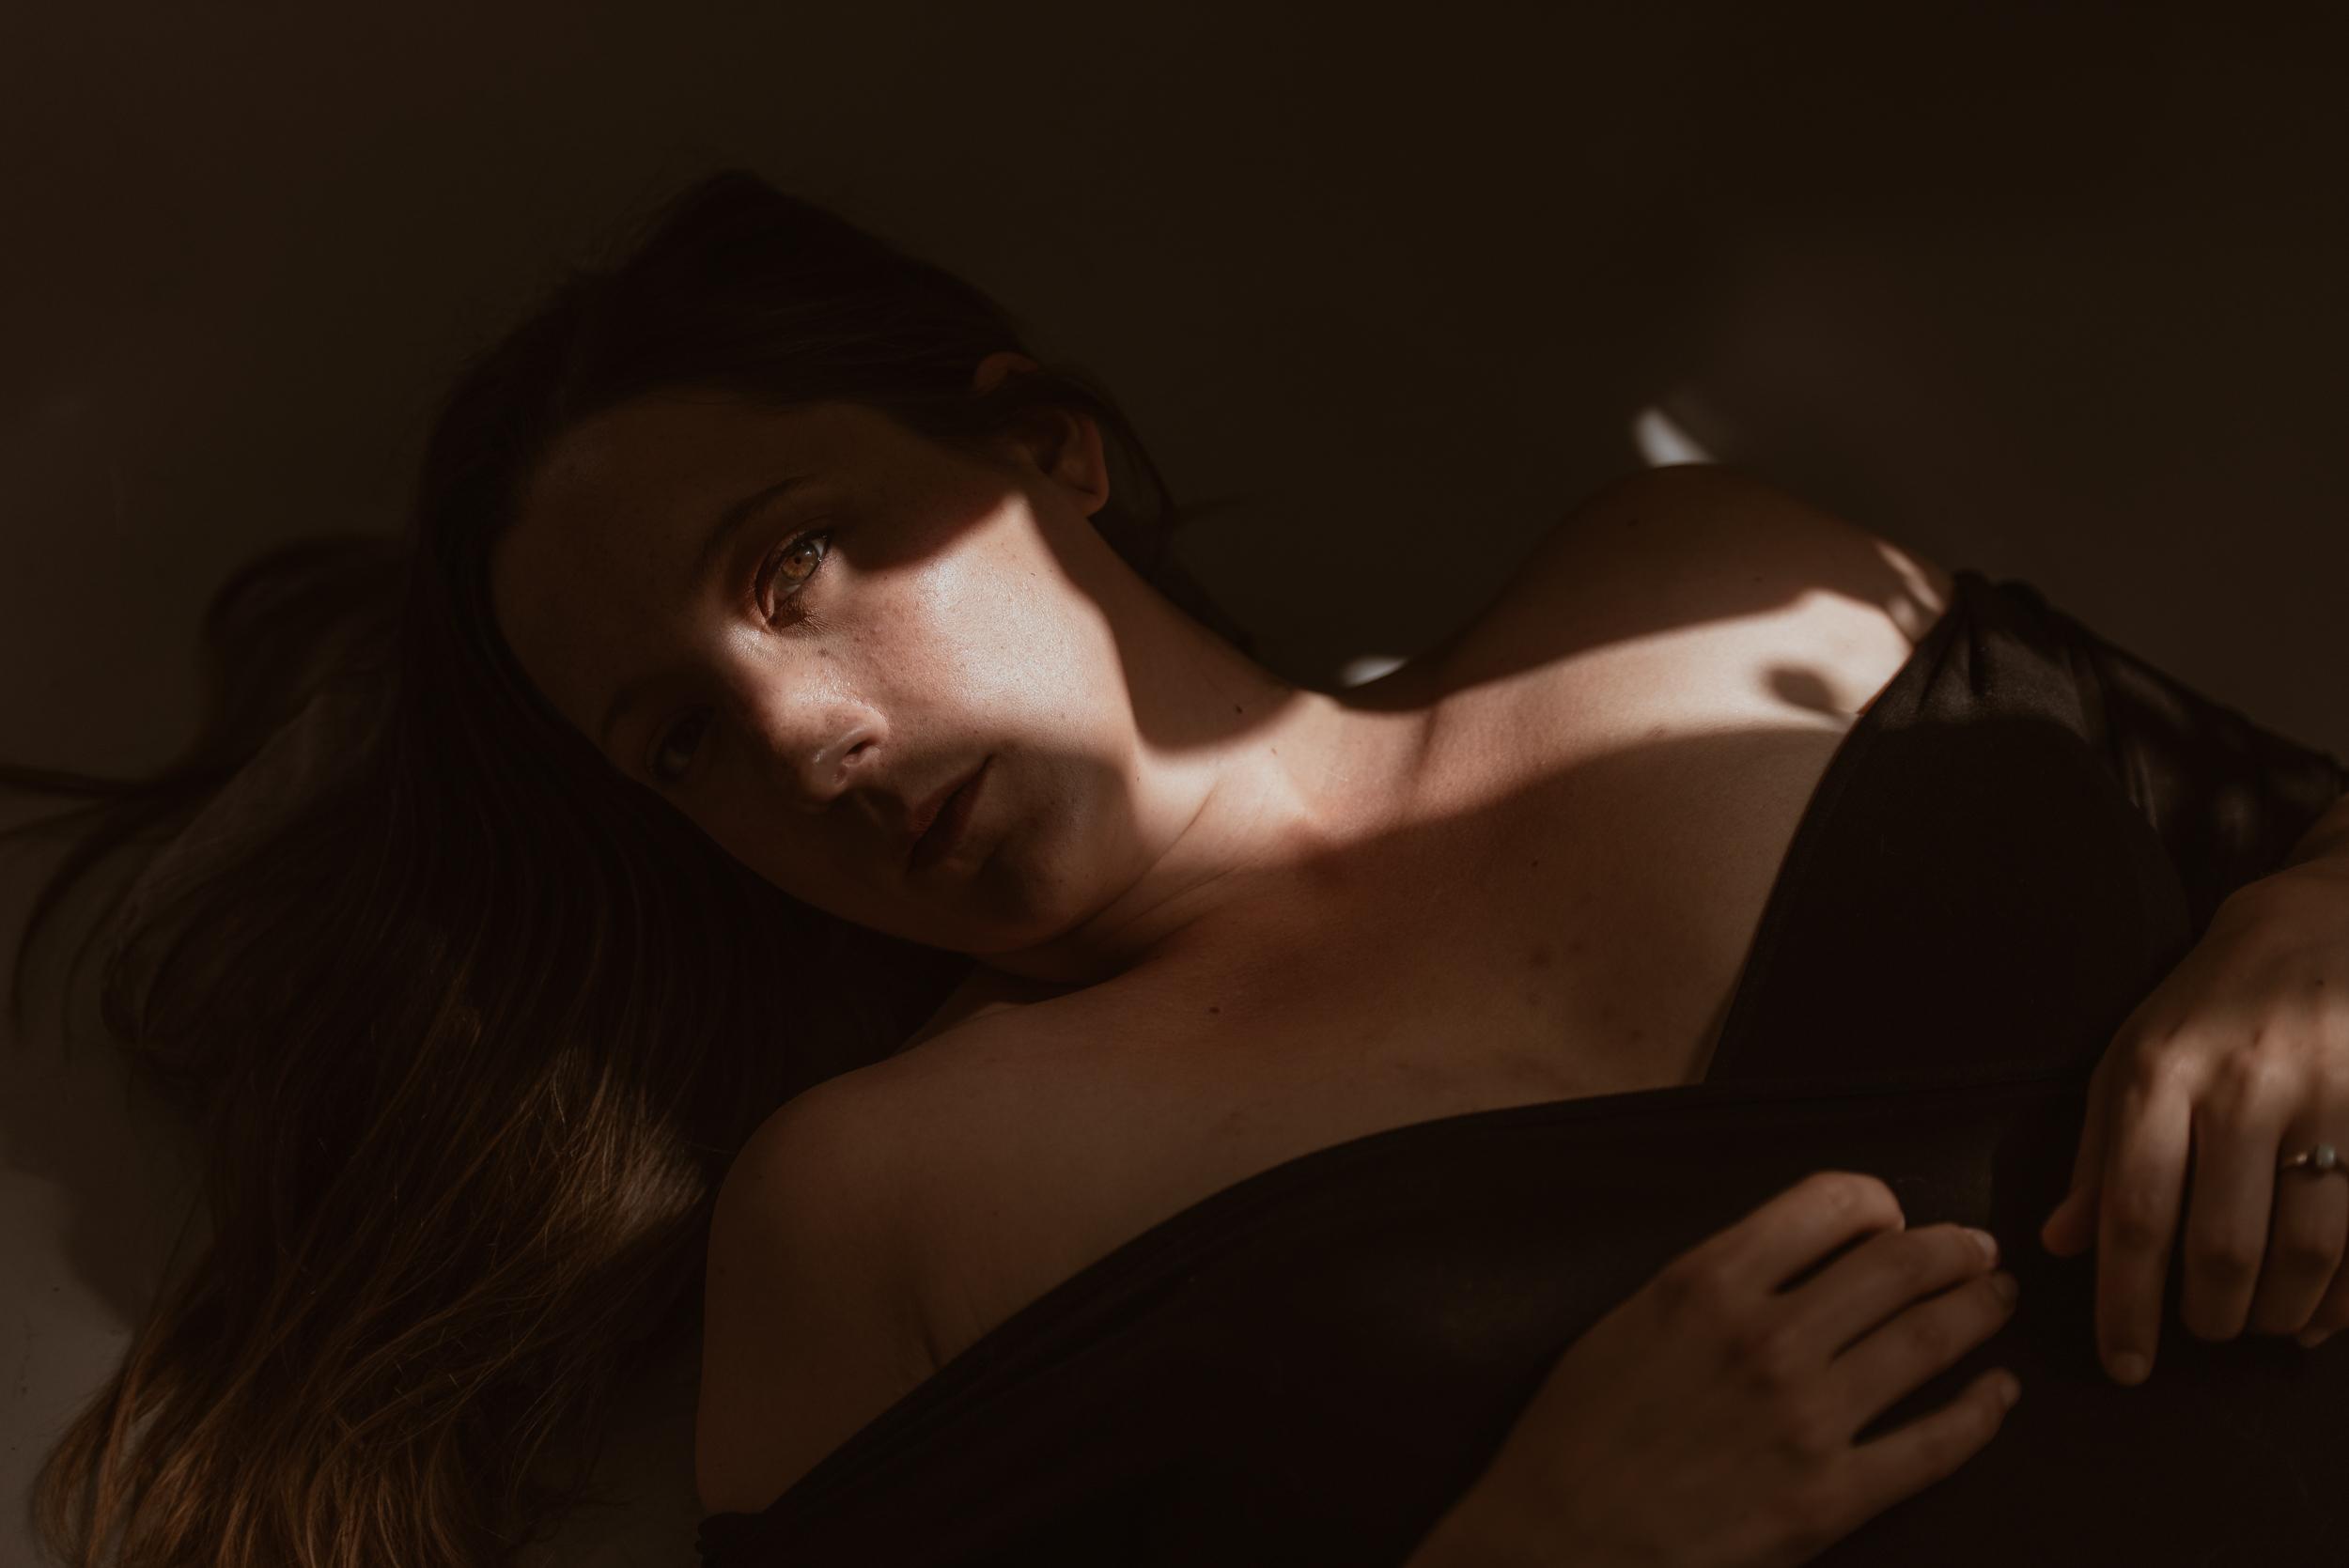 20190907-AmandaLewis-PortraitsCassRudolph-SocialMediaSize-16.jpg